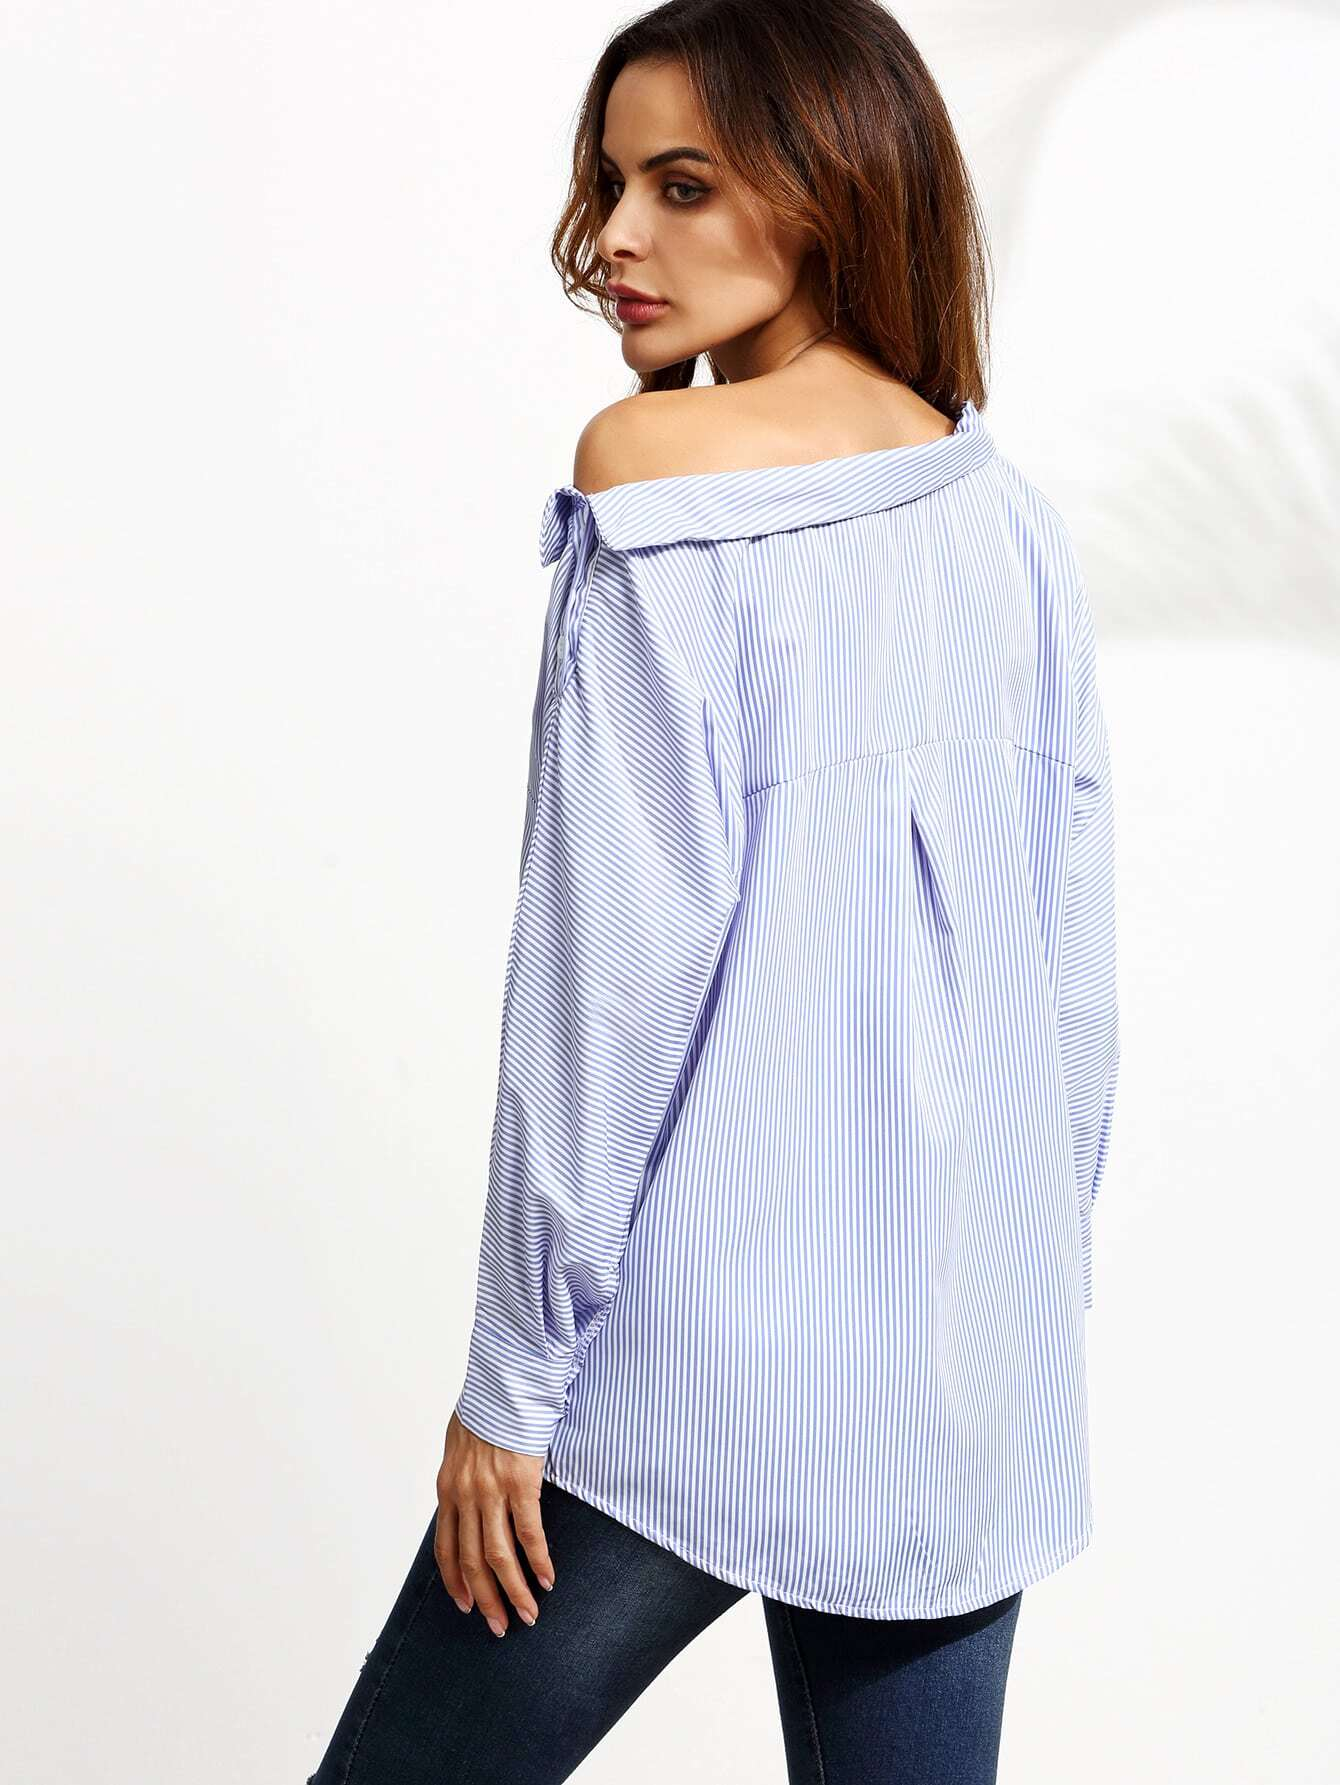 blouse160818104_2